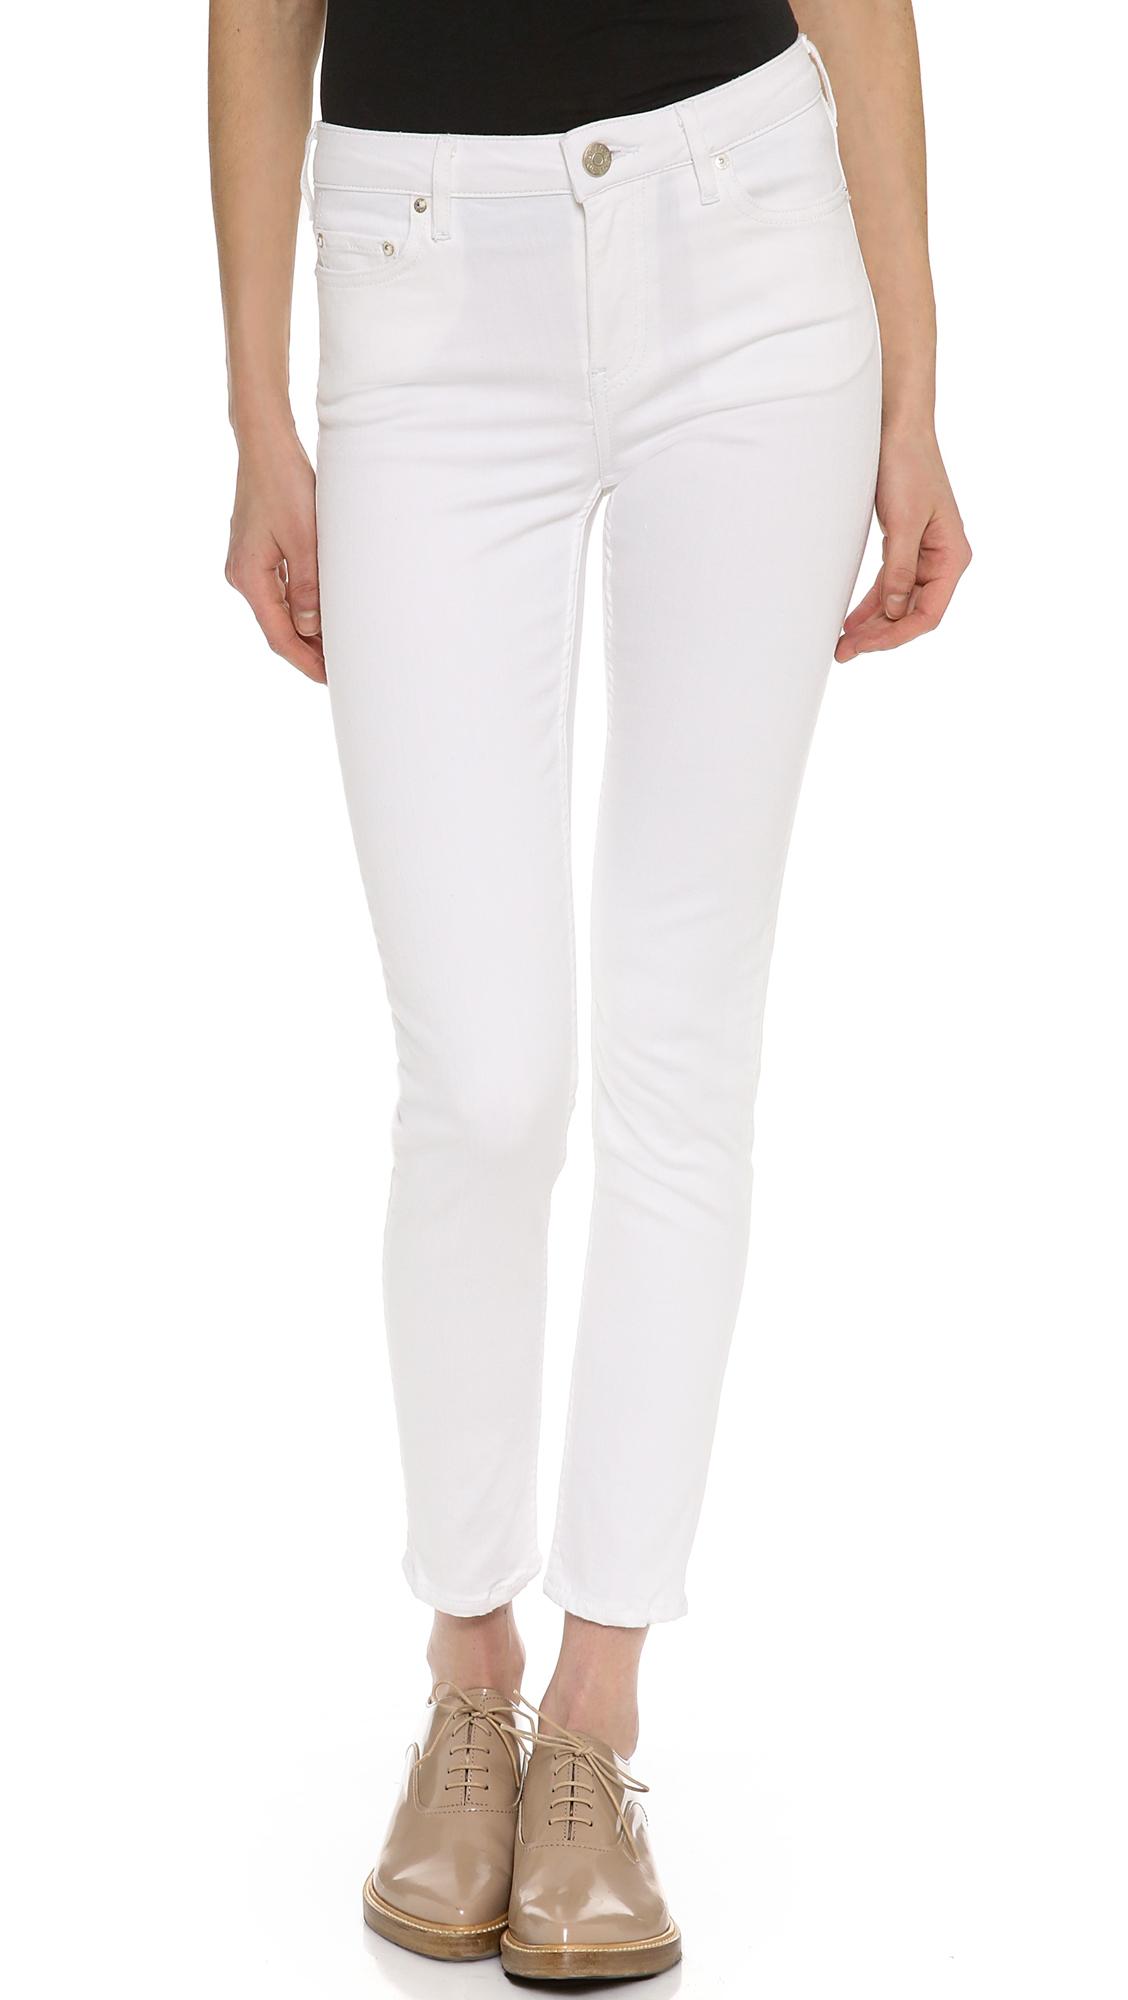 Women\u2019s Acne Roc  Optic White Denim Jeans Size 30-31